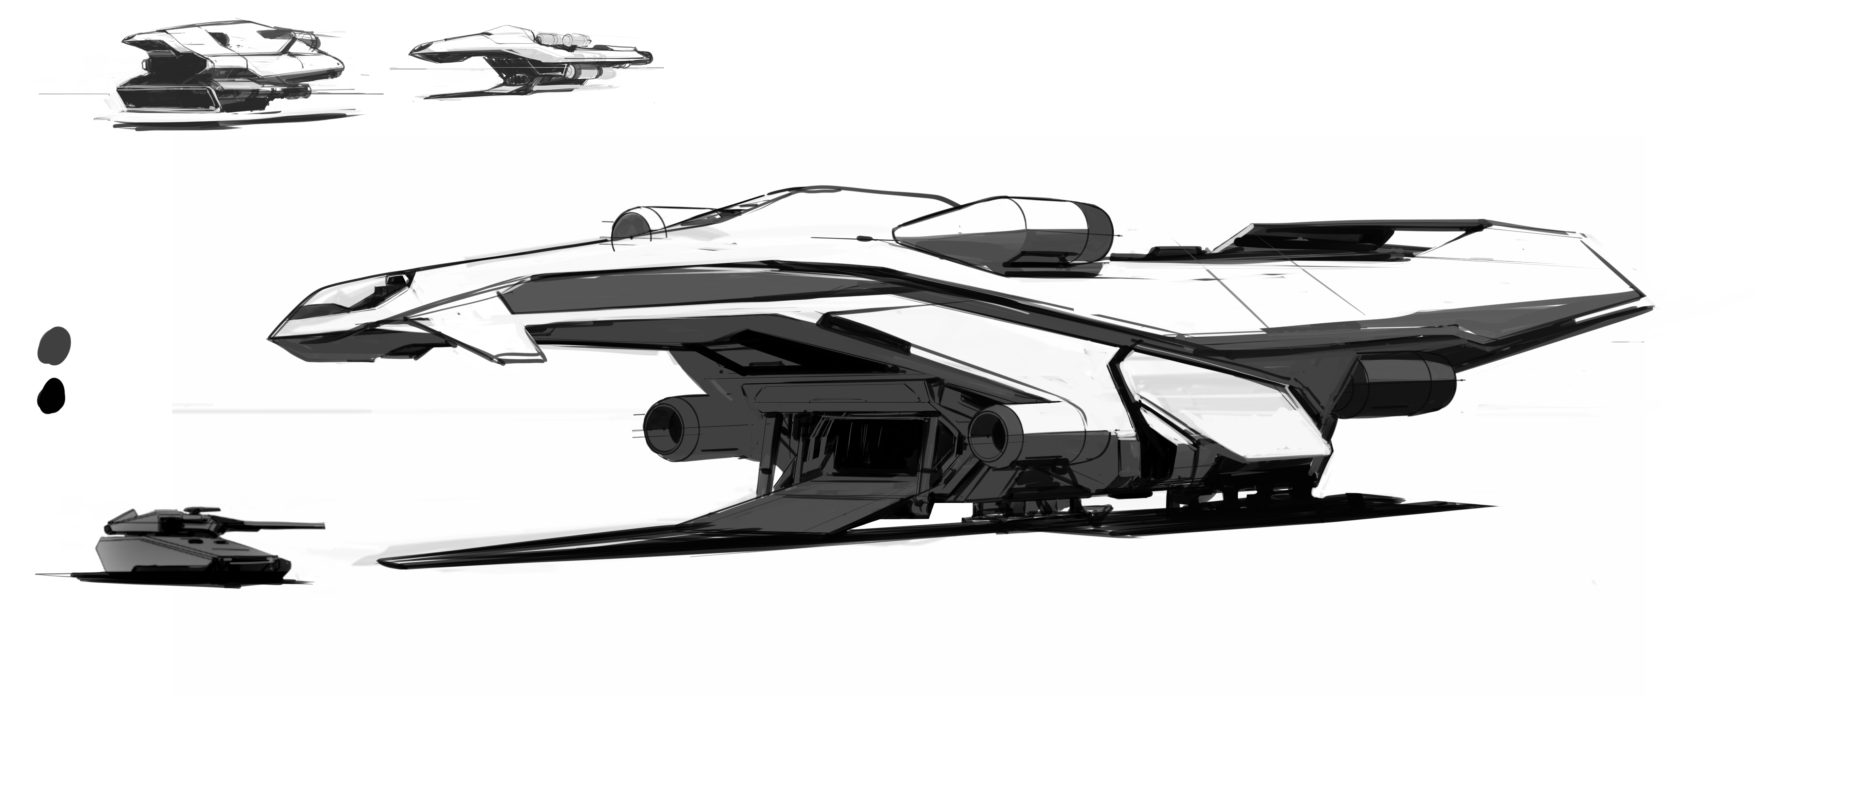 SC-Hercules-Concept-Art-11.jpg